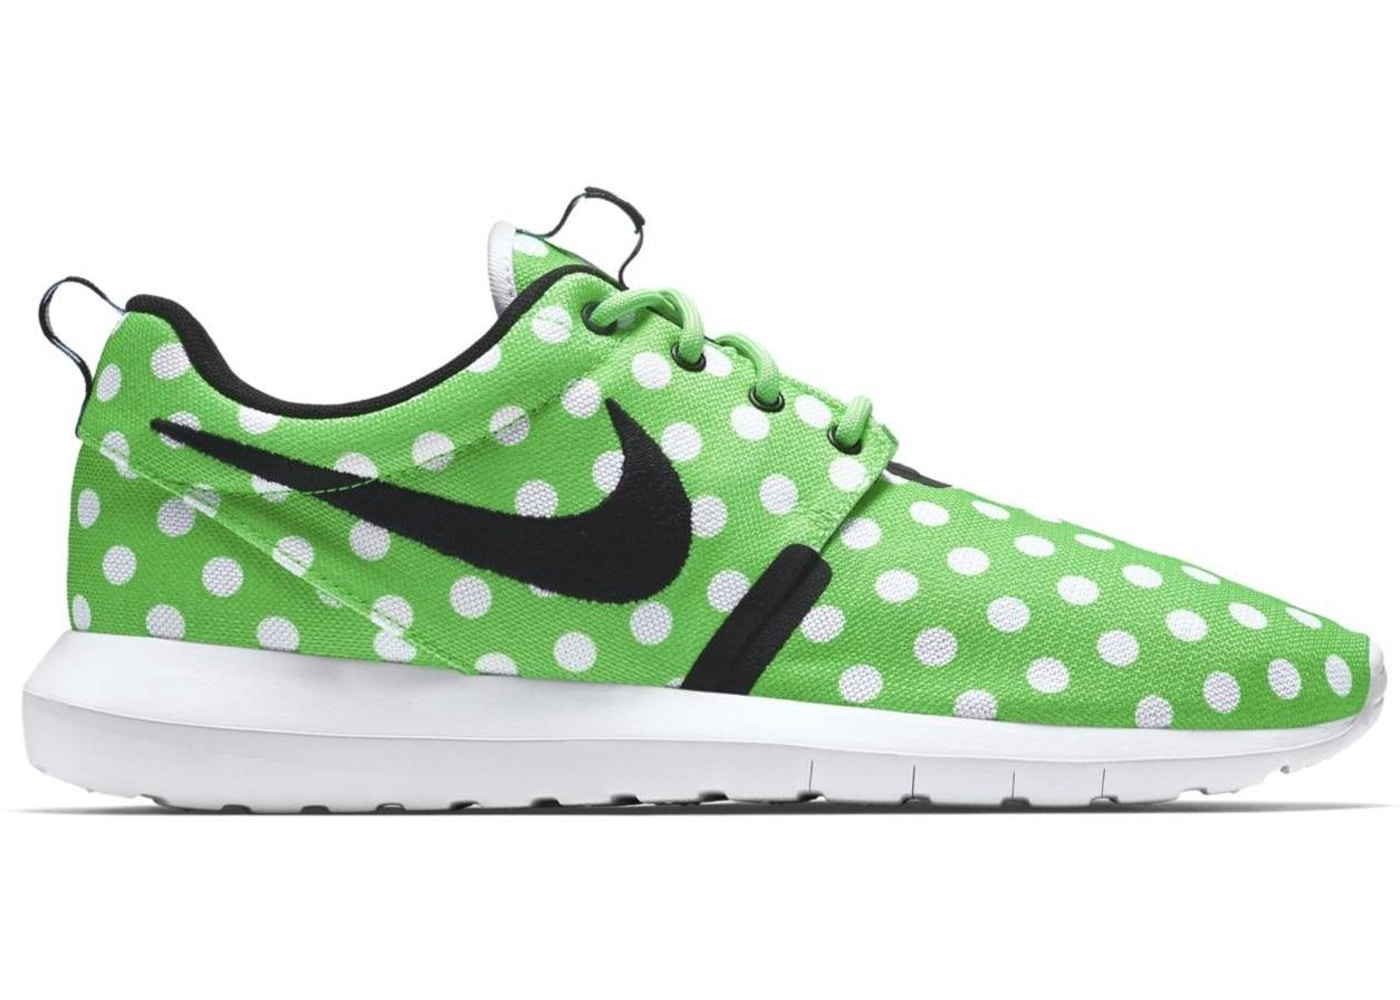 new product be924 6e407 Nike Roshe Run Polka Dot Pack Green - 810857-300